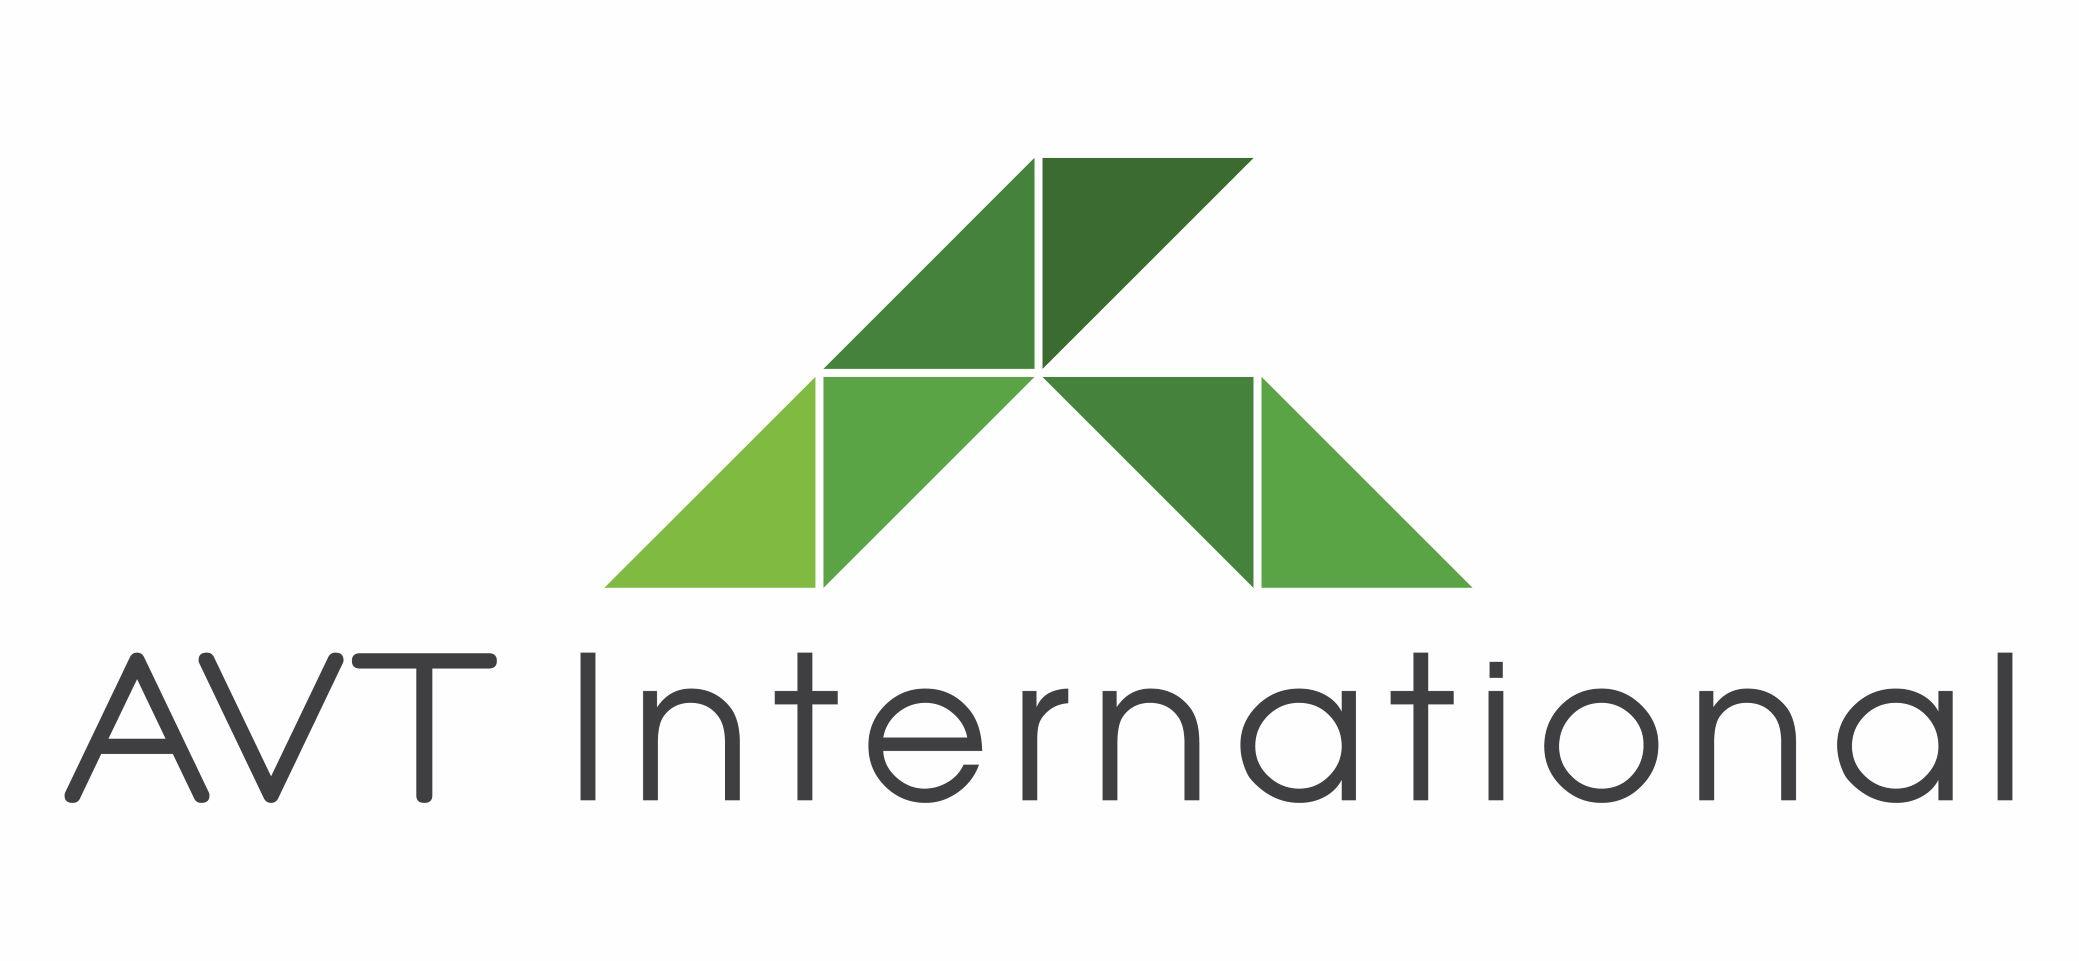 AVT International